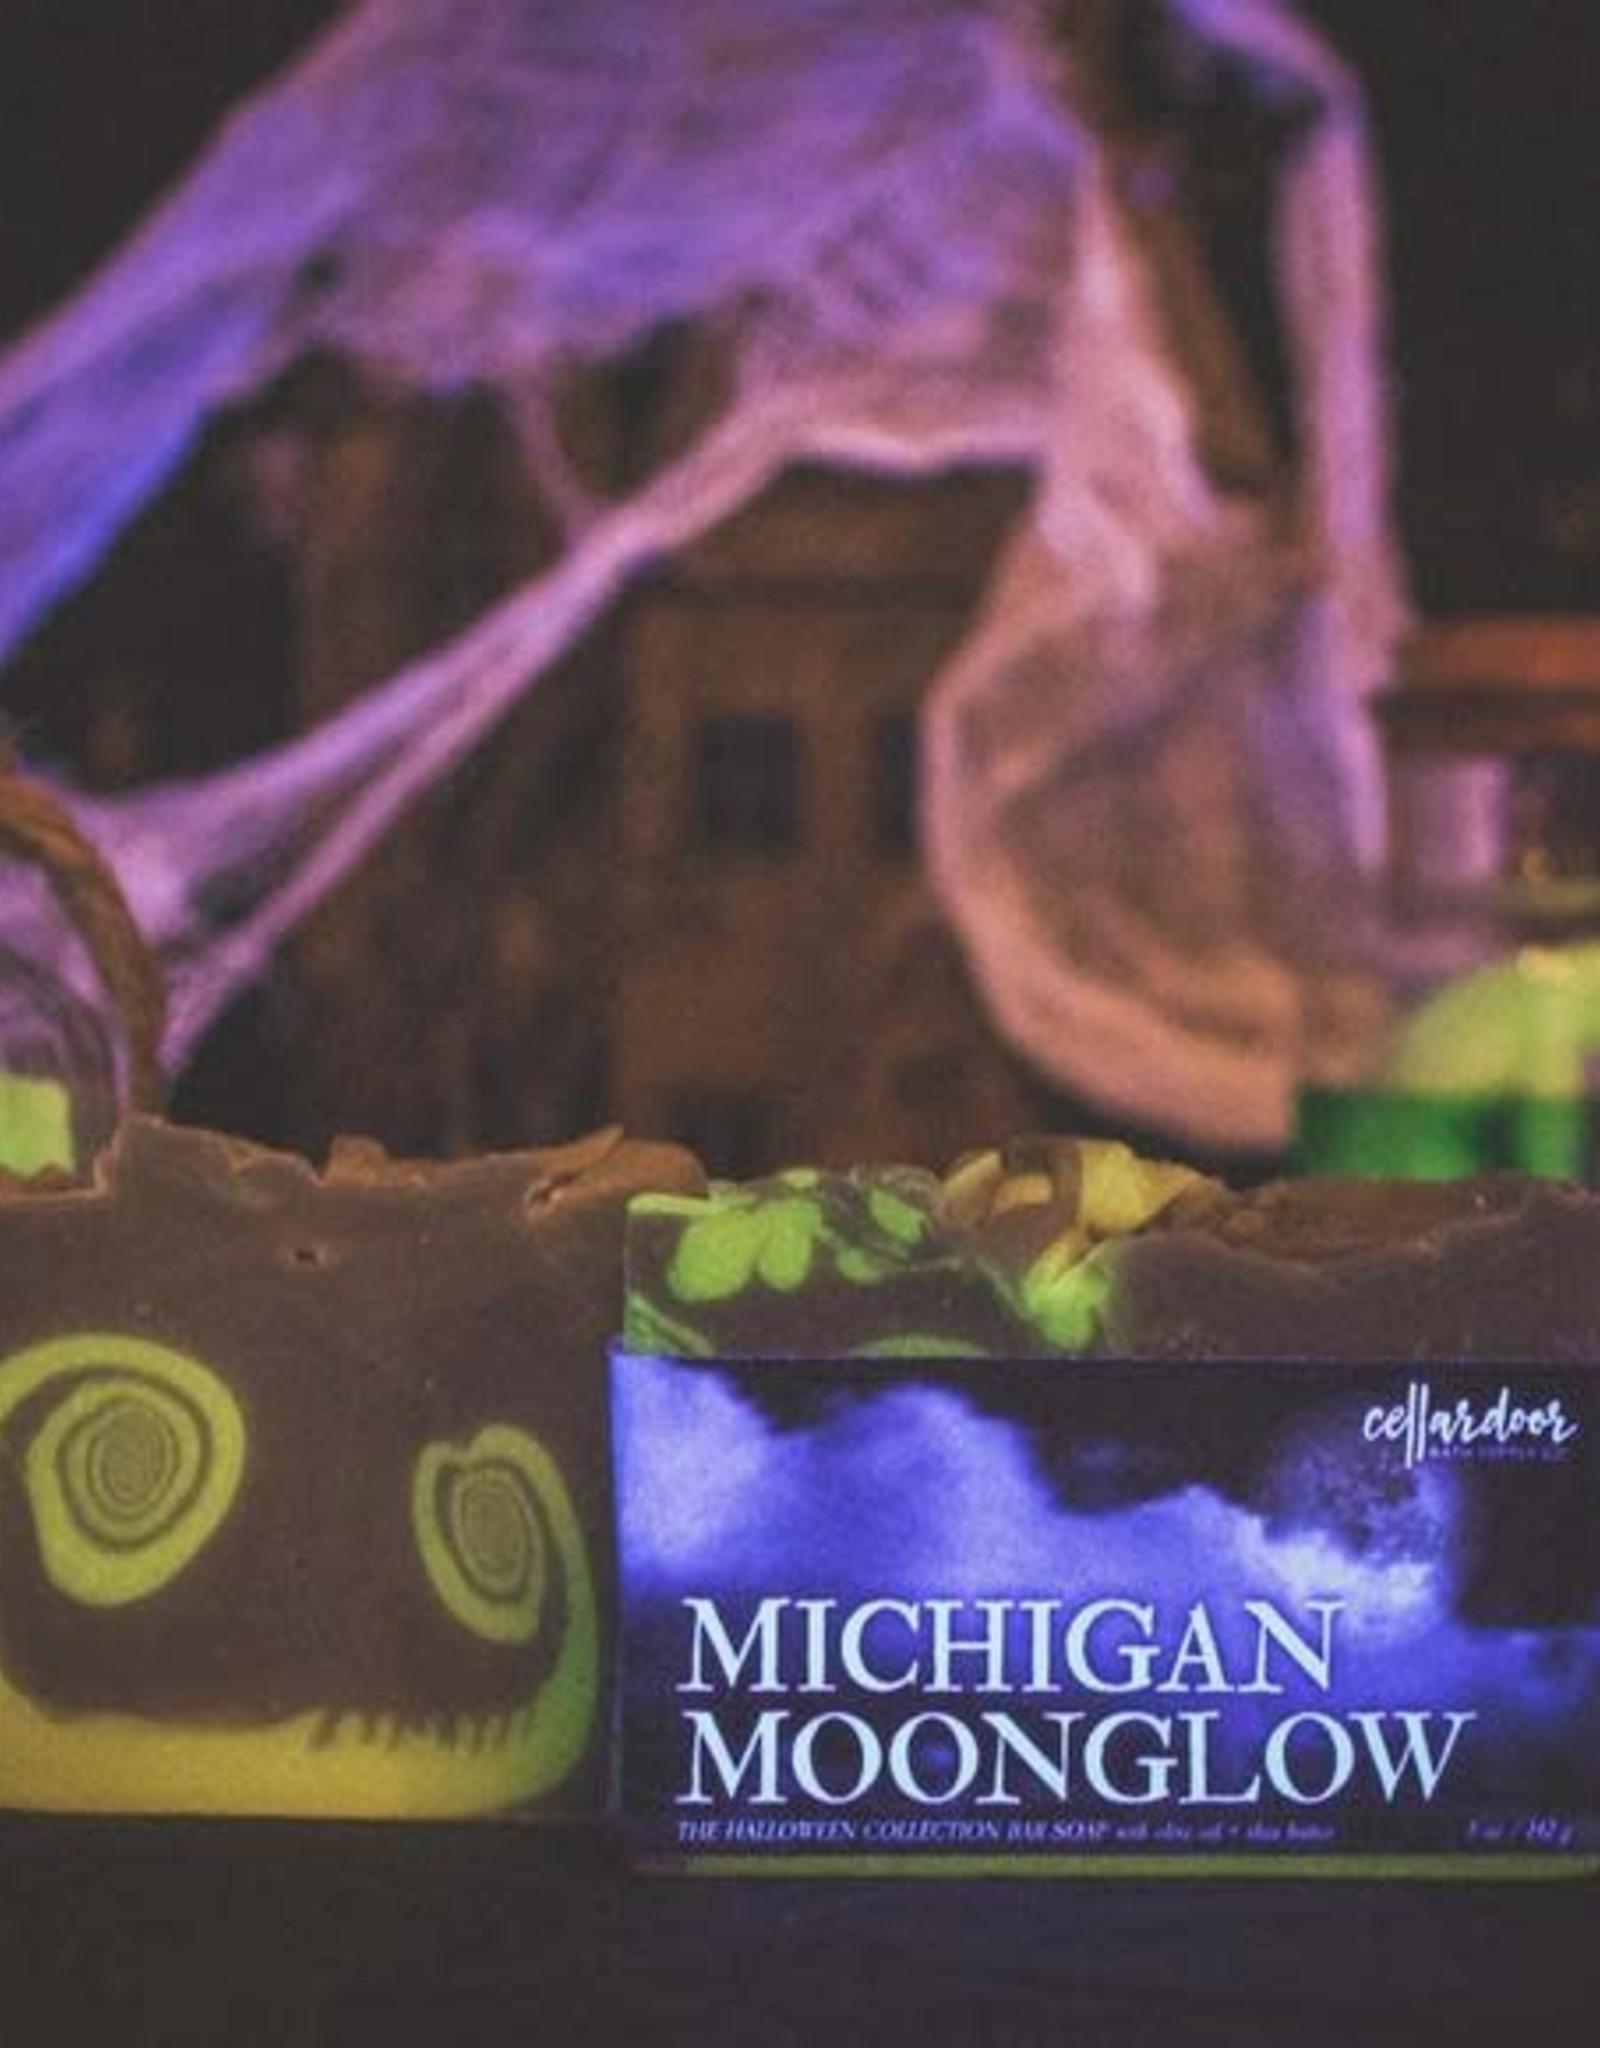 CellarDoor CellarDoor Bath Supply Co.   Michigan Moonglow Bar Soap